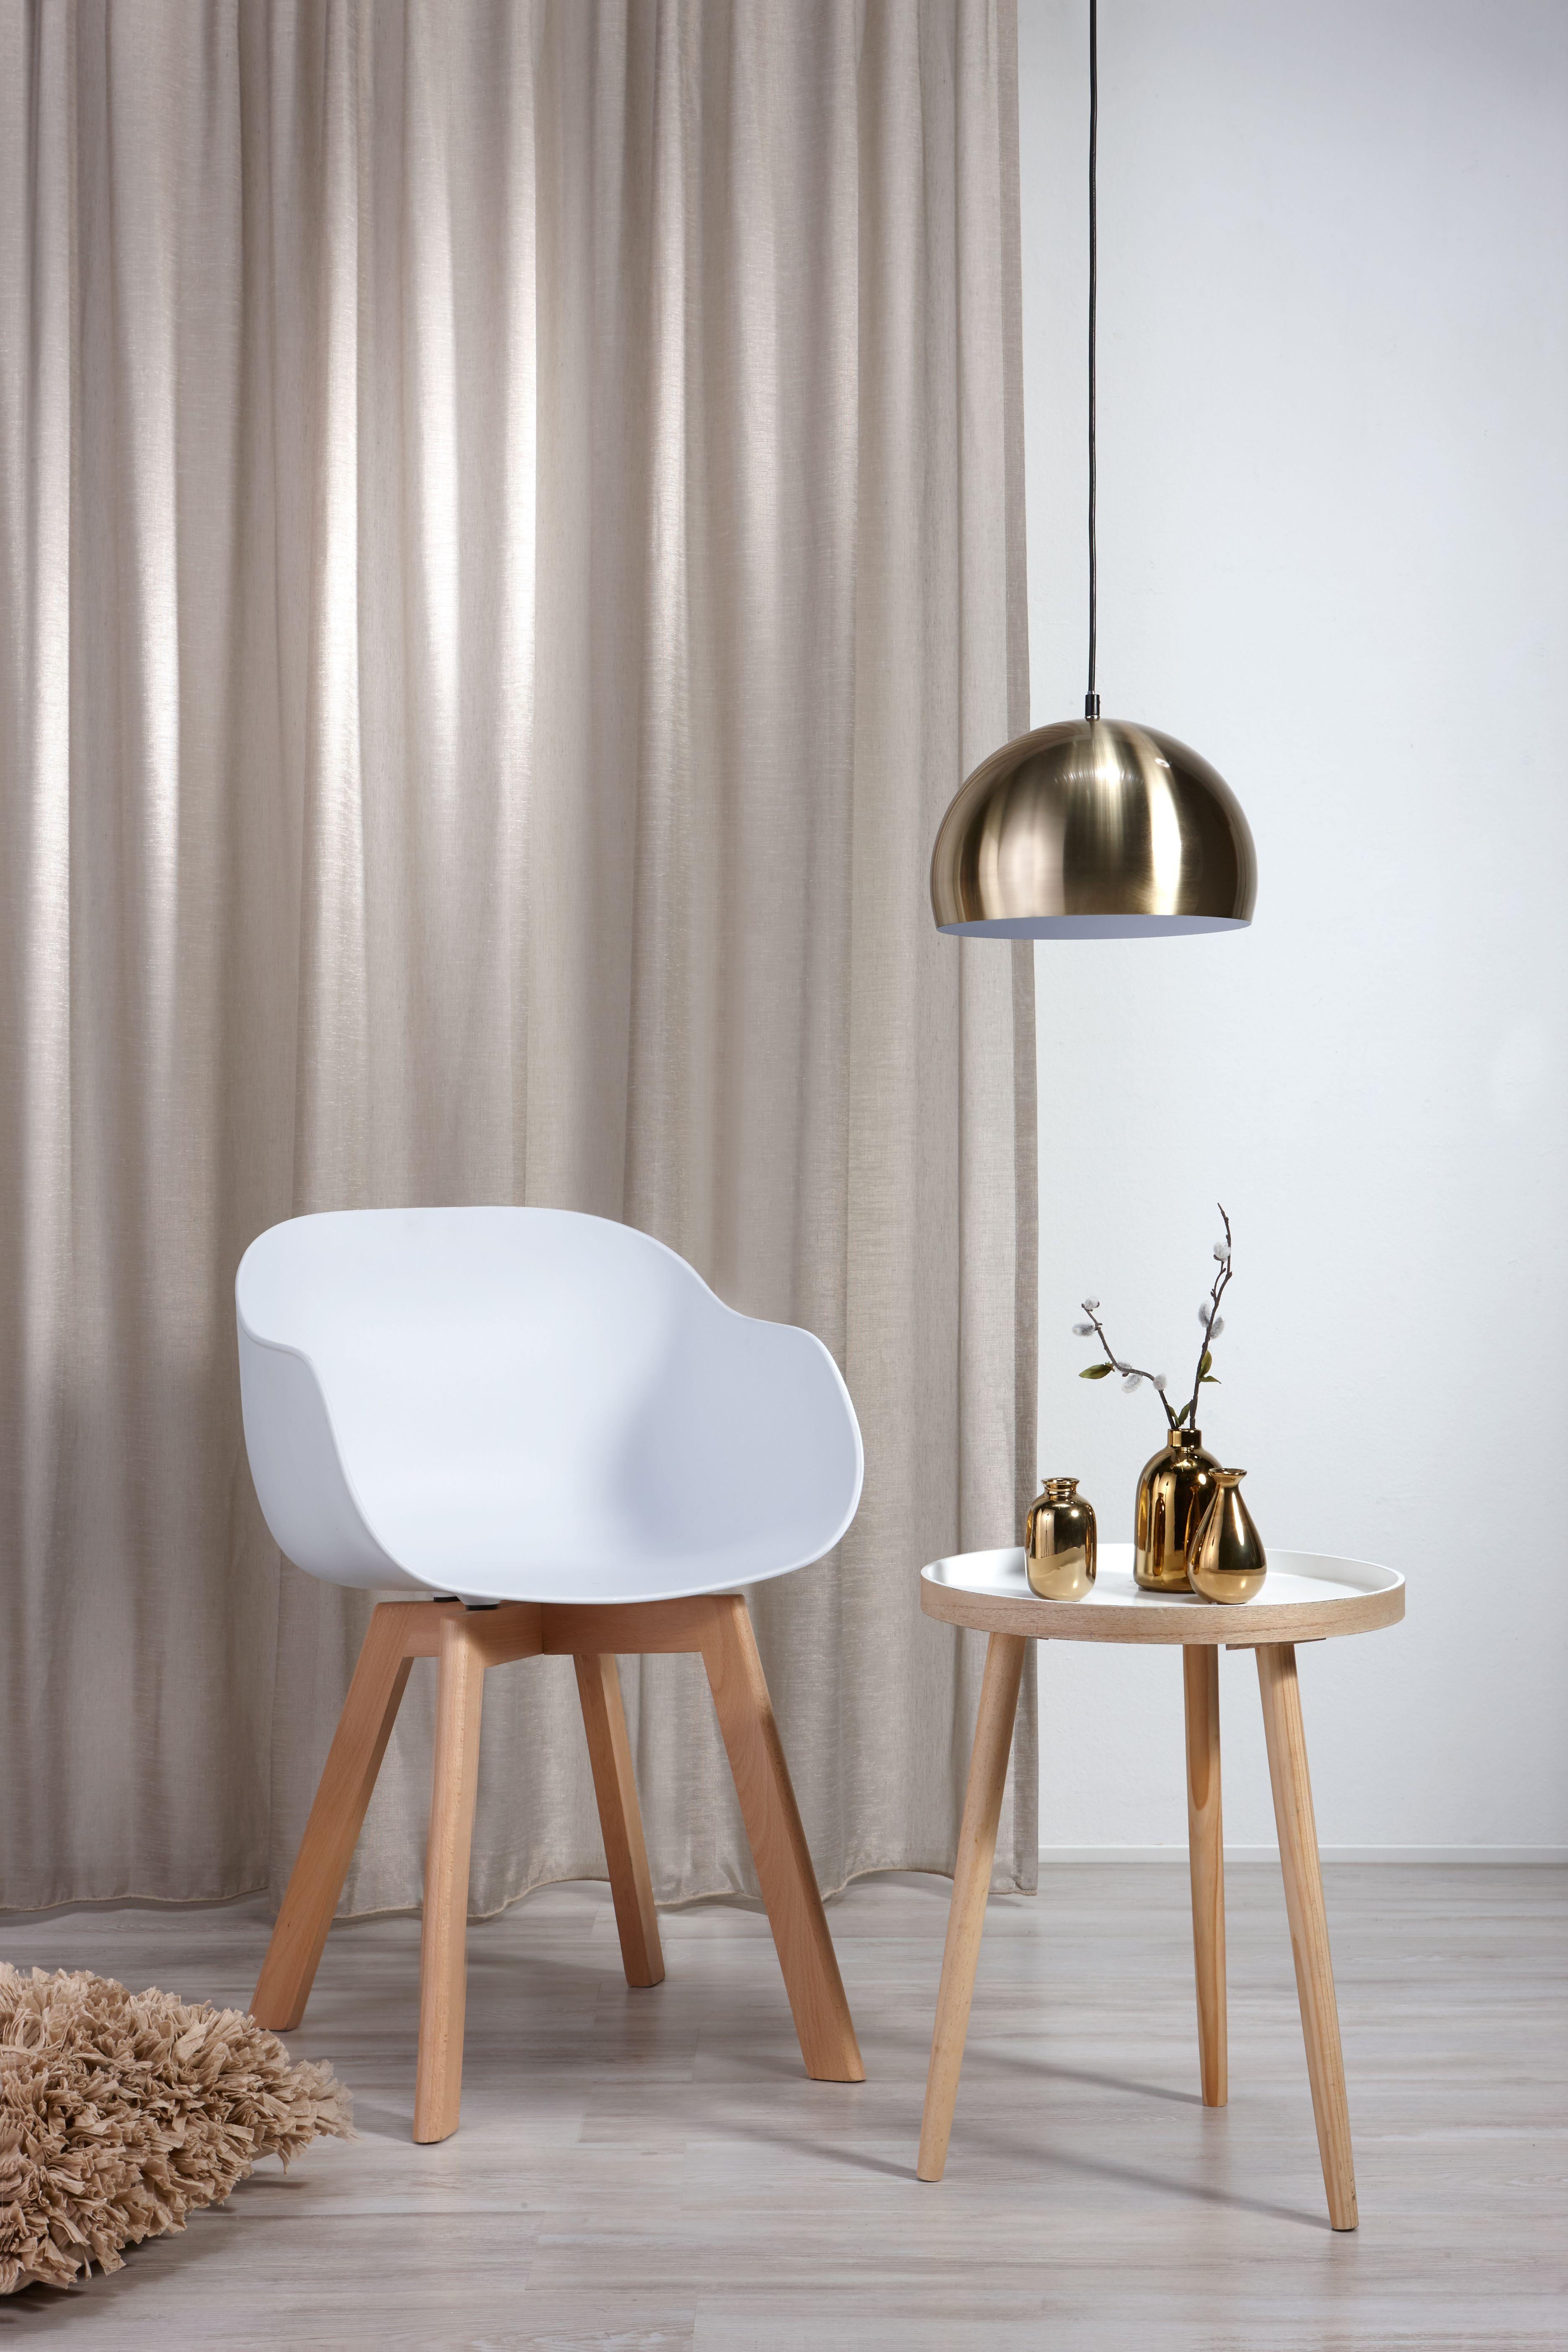 Kuipstoel new york wit goud modern en hout - Interieur decoratie modern hout ...